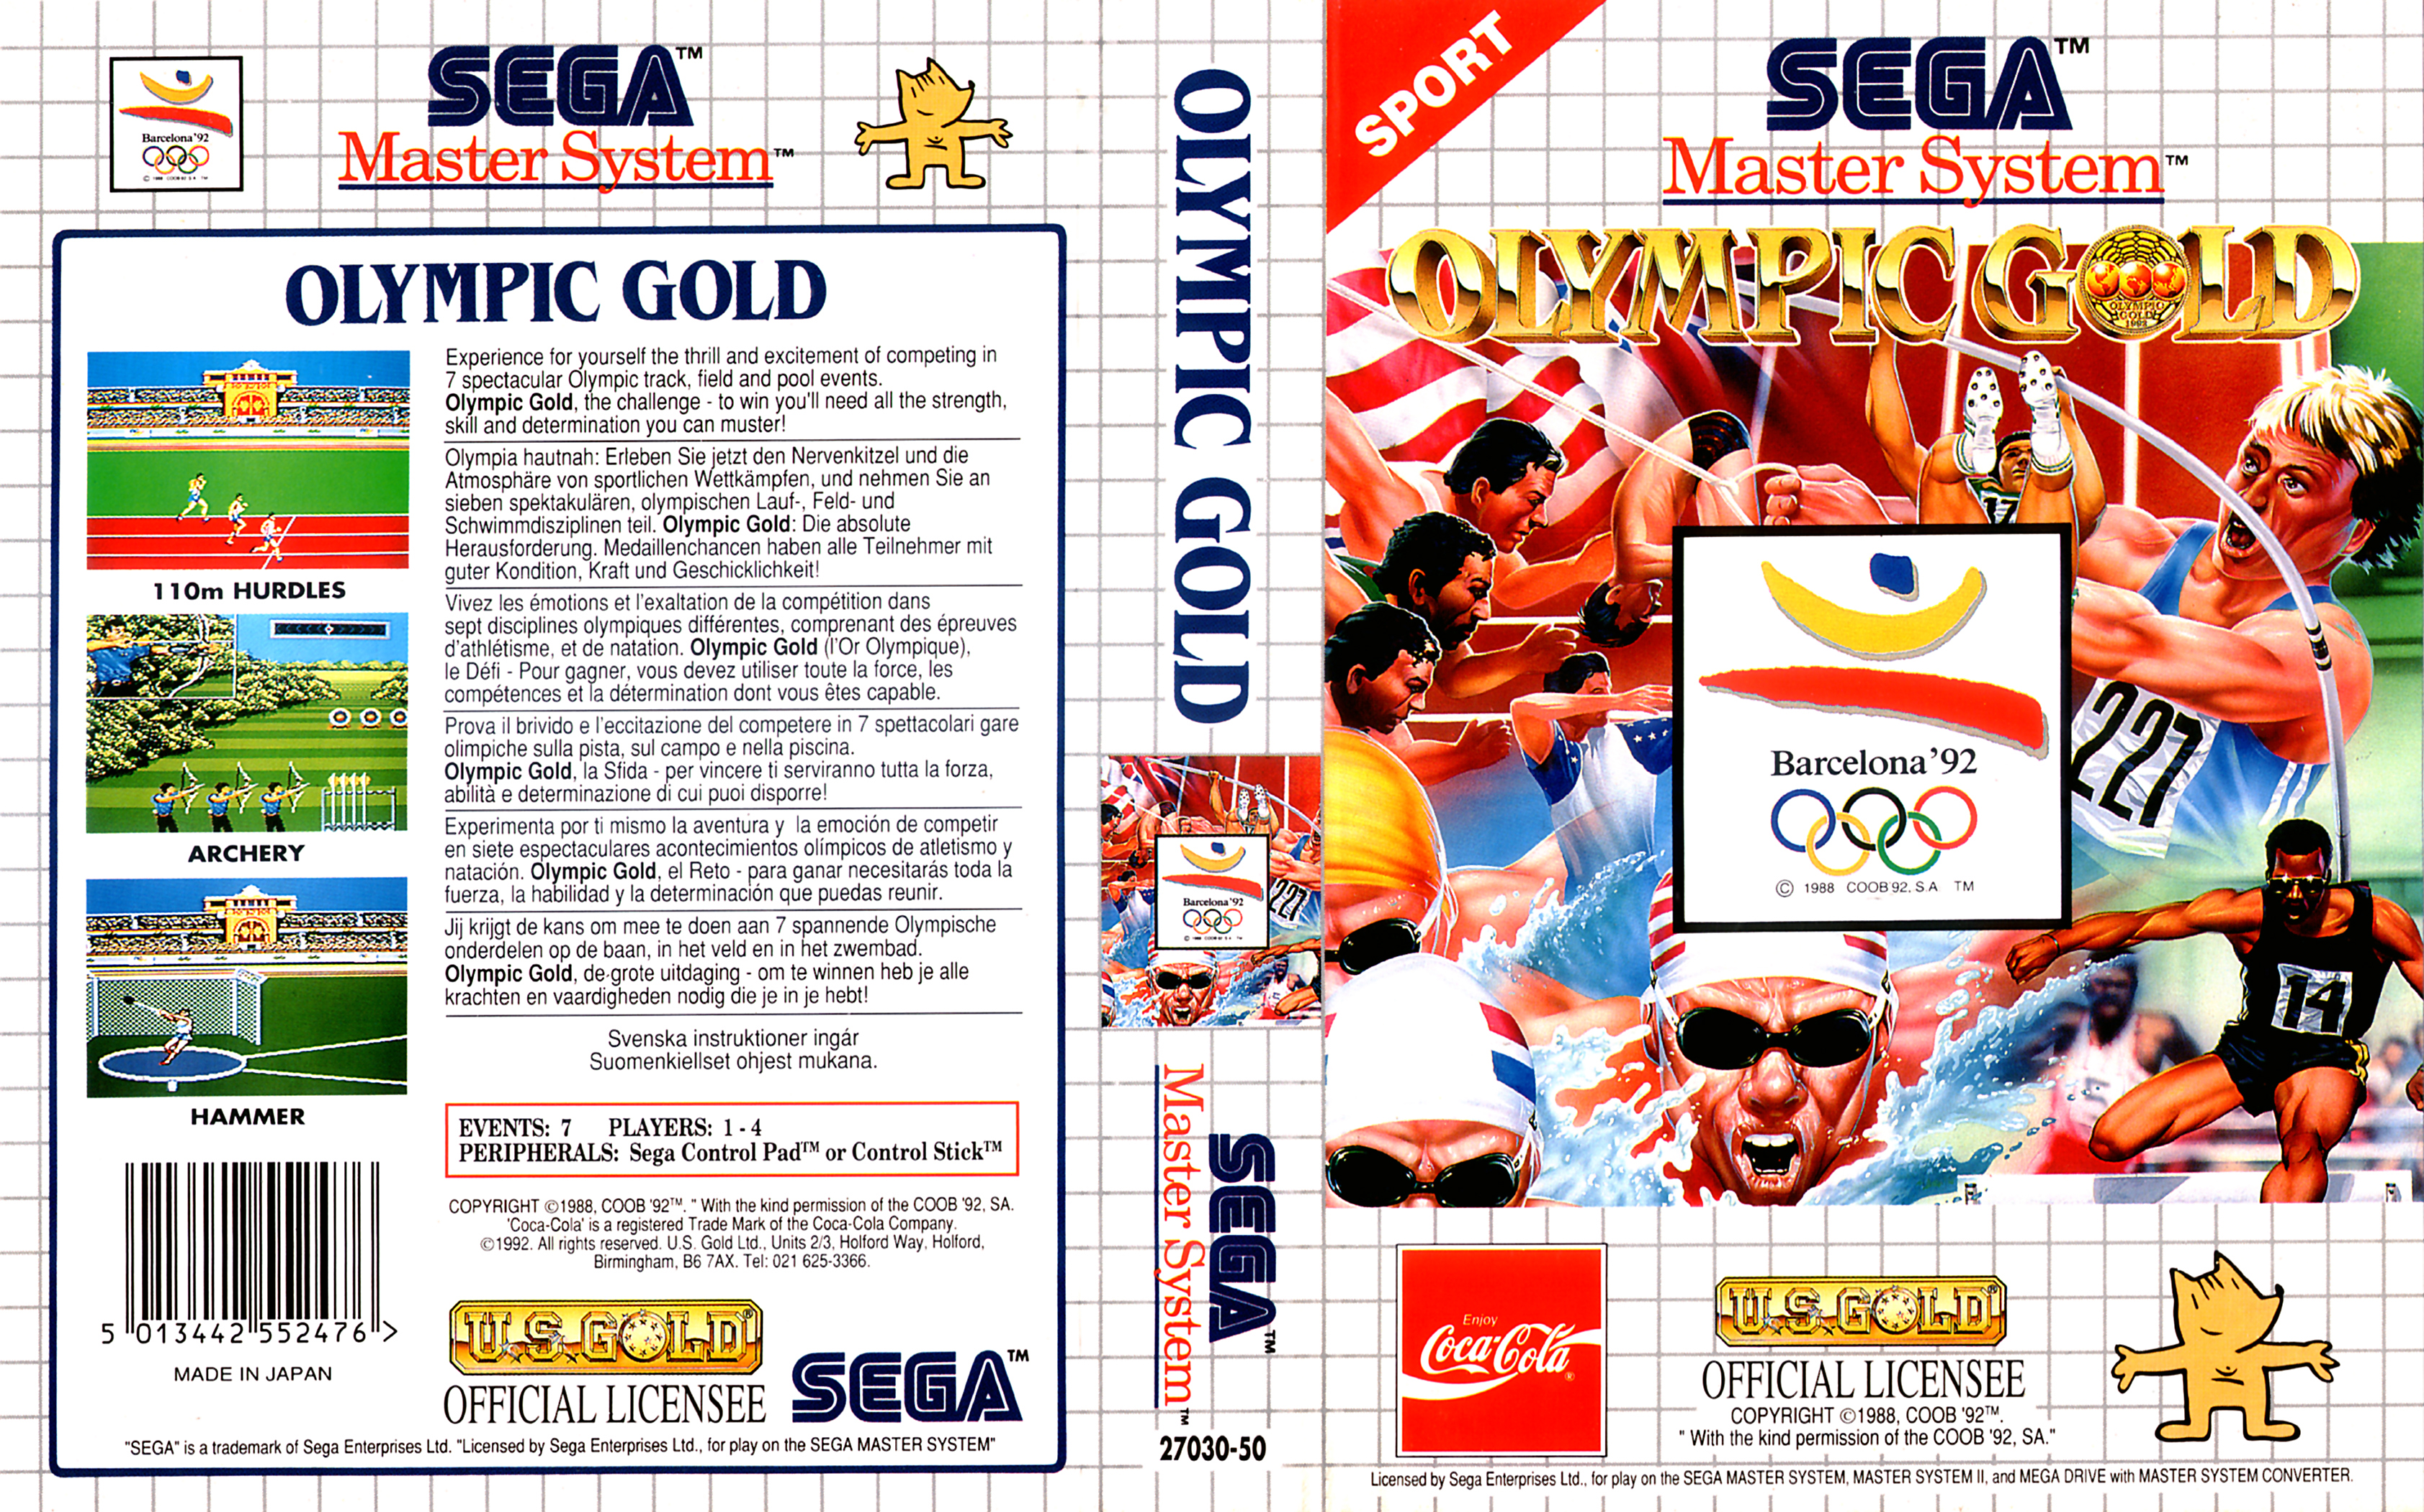 Sega Master System O Game Covers Box Scans Box Art CD ...